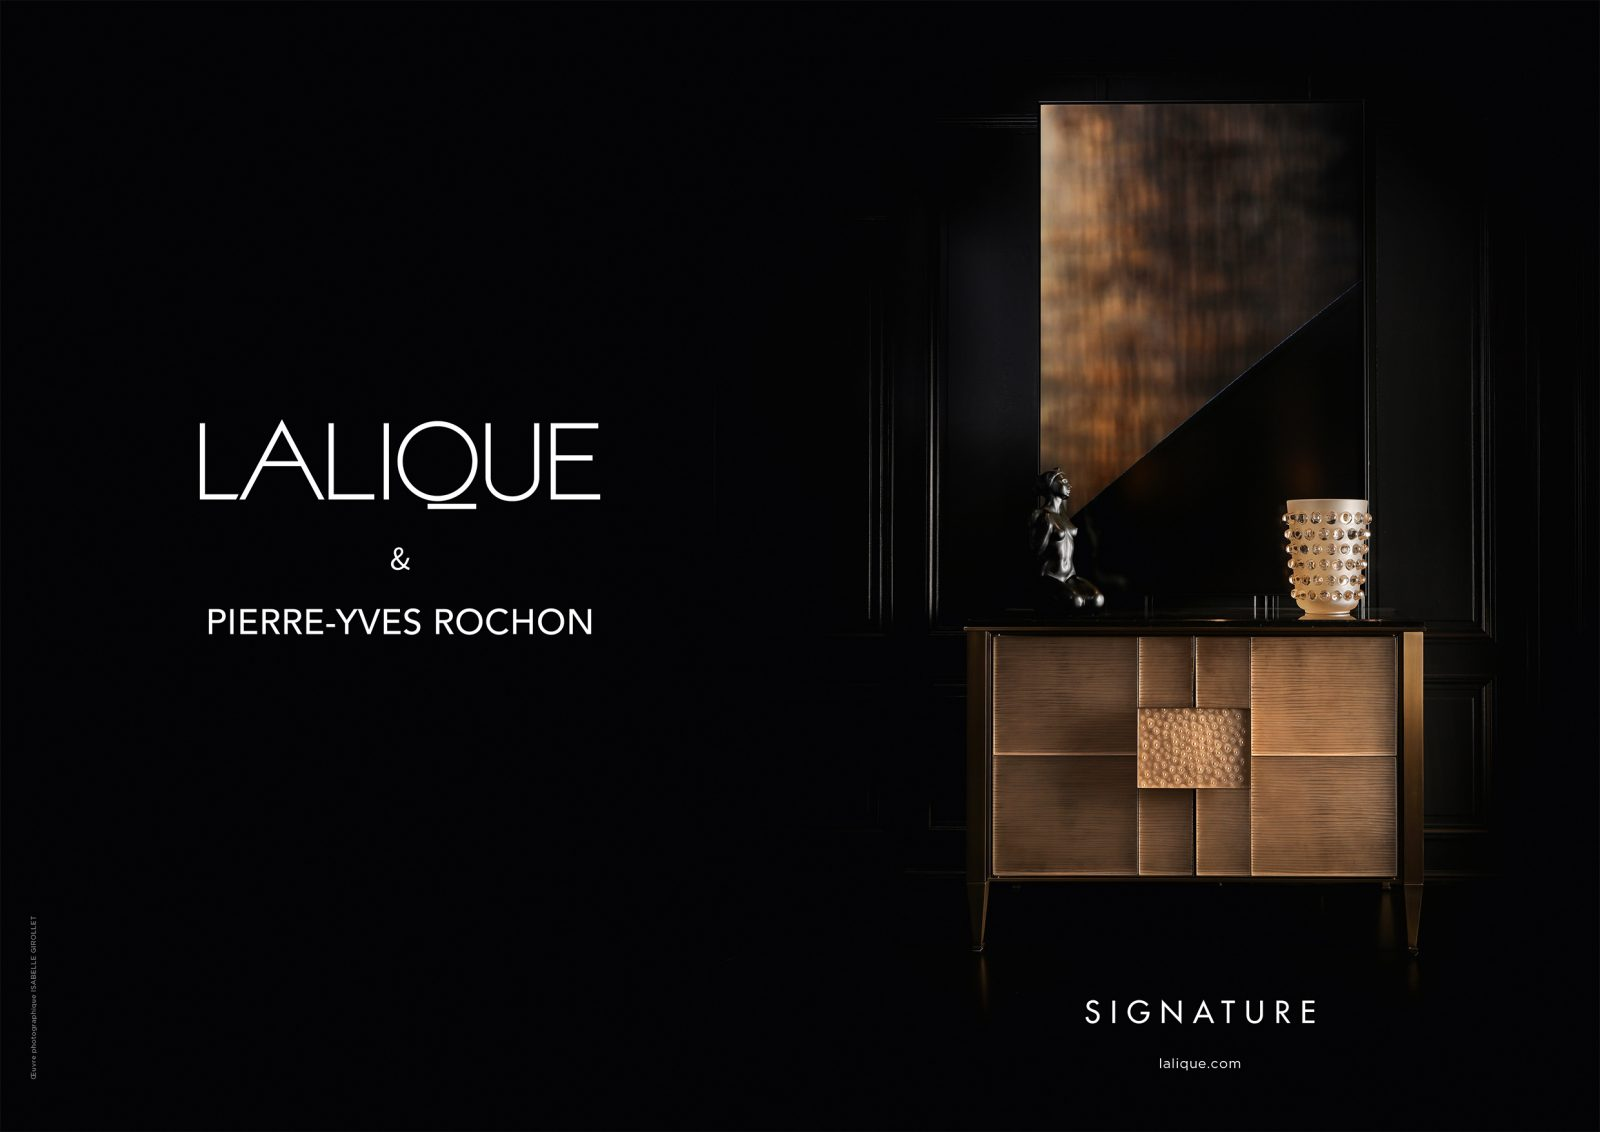 Lalique - Pierre-Yves Rochon